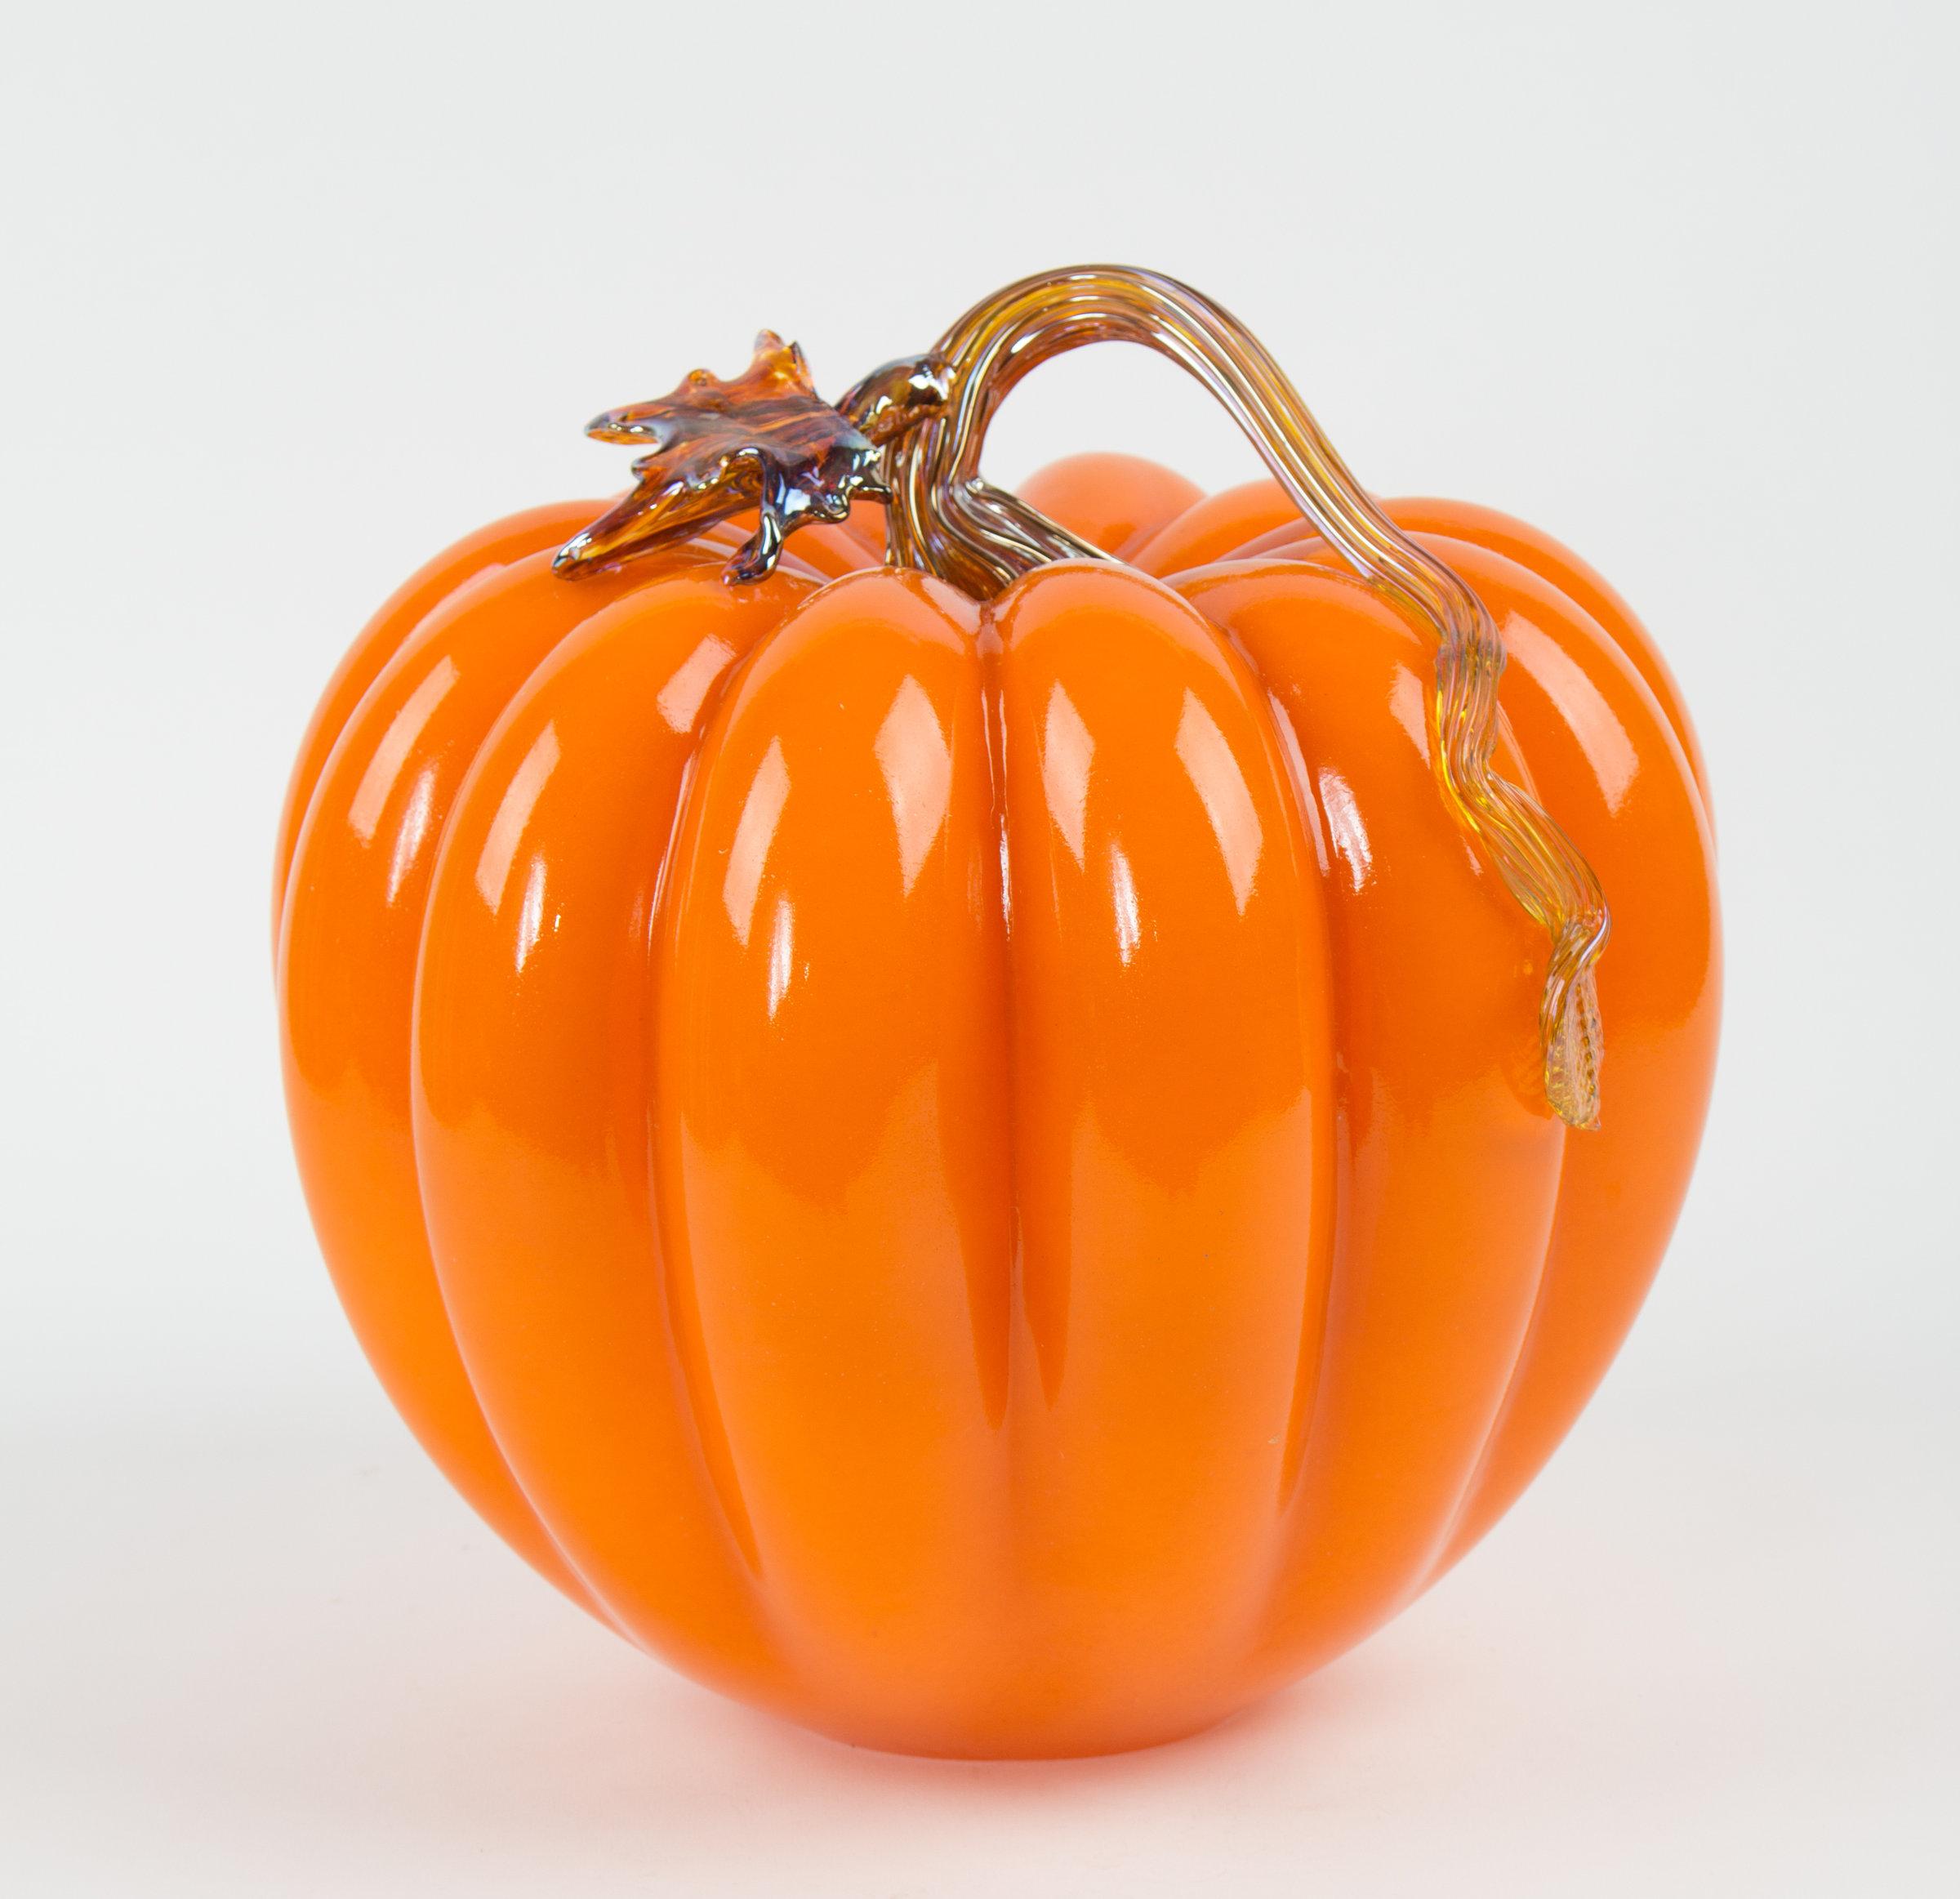 Large Orange Pumpkin By Treg Silkwood Art Glass Sculpture Artful Home